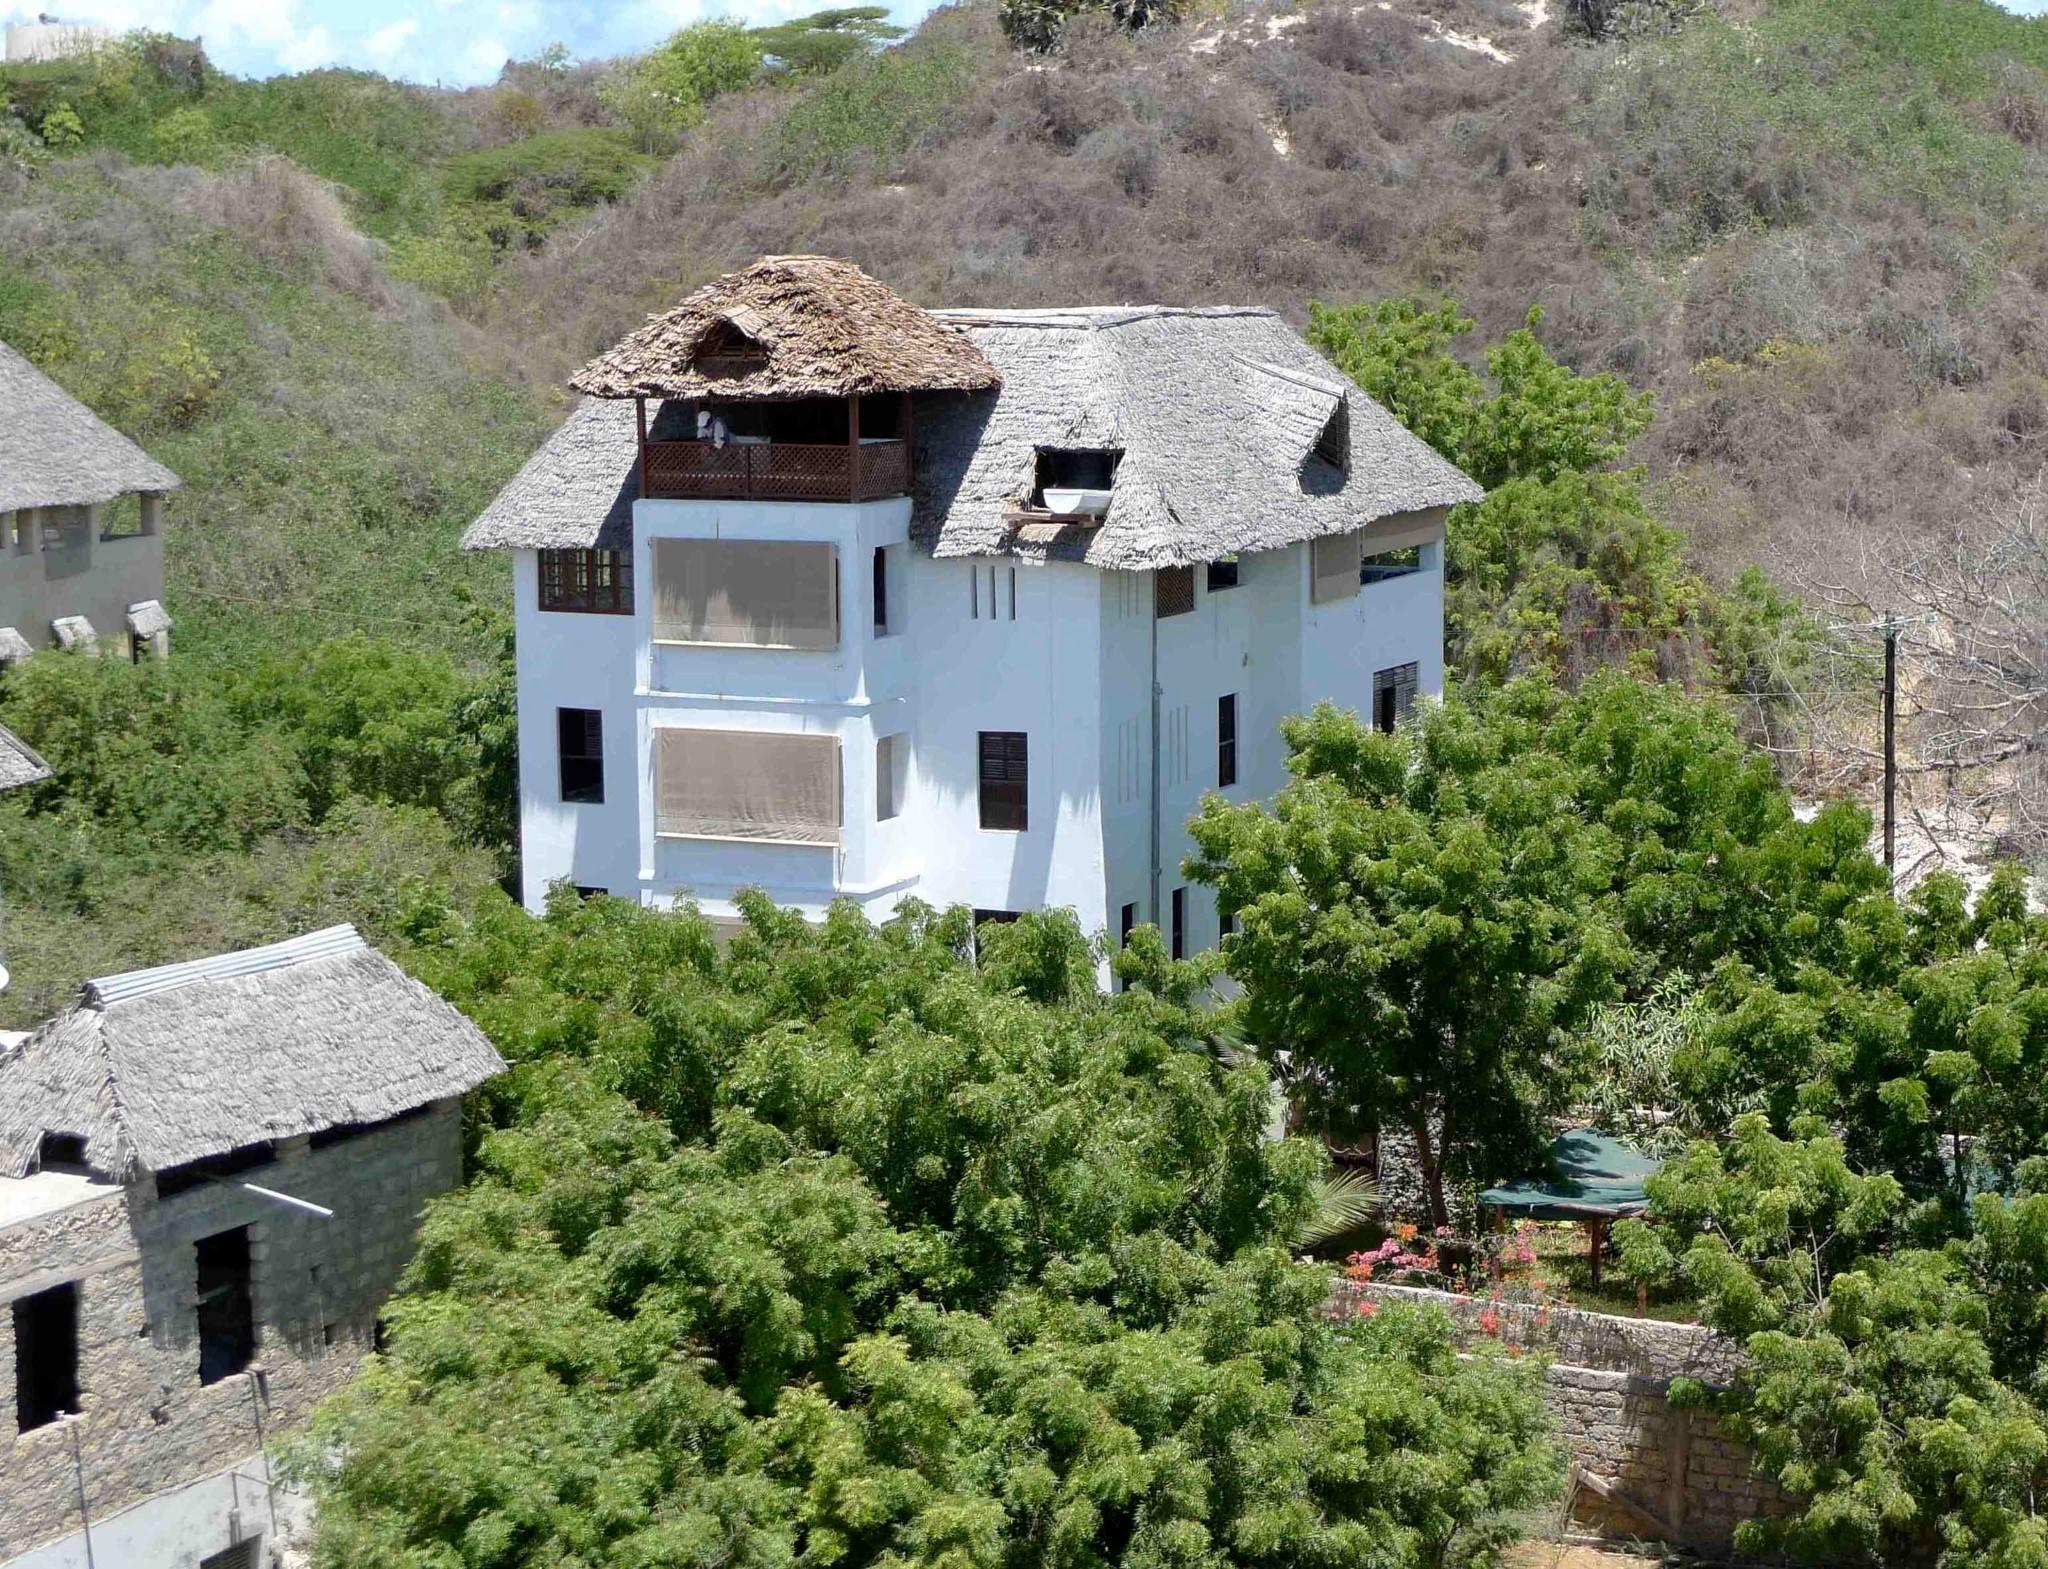 DEULI HOUSE - Shela, Lamu Island, Kenya